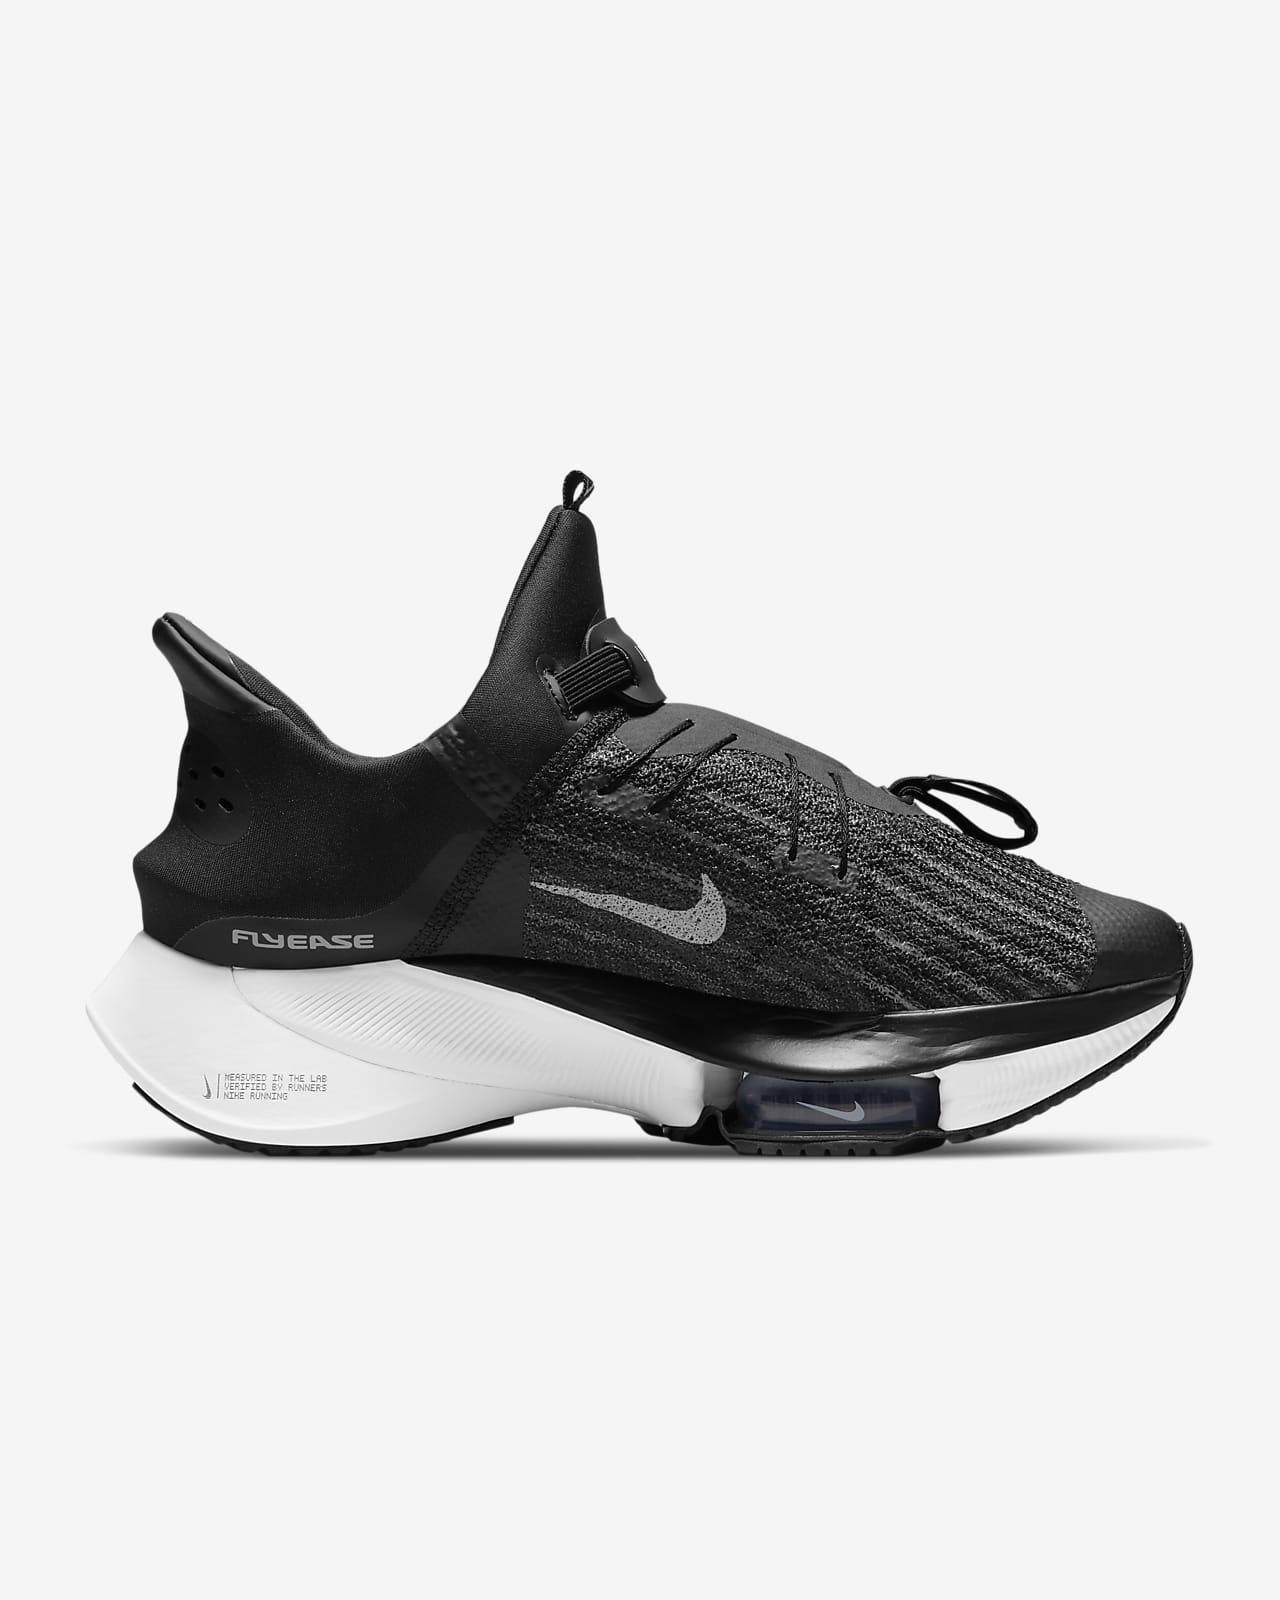 Nike Air Zoom Tempo NEXT% FlyEase Women's Running Shoe. Nike LU